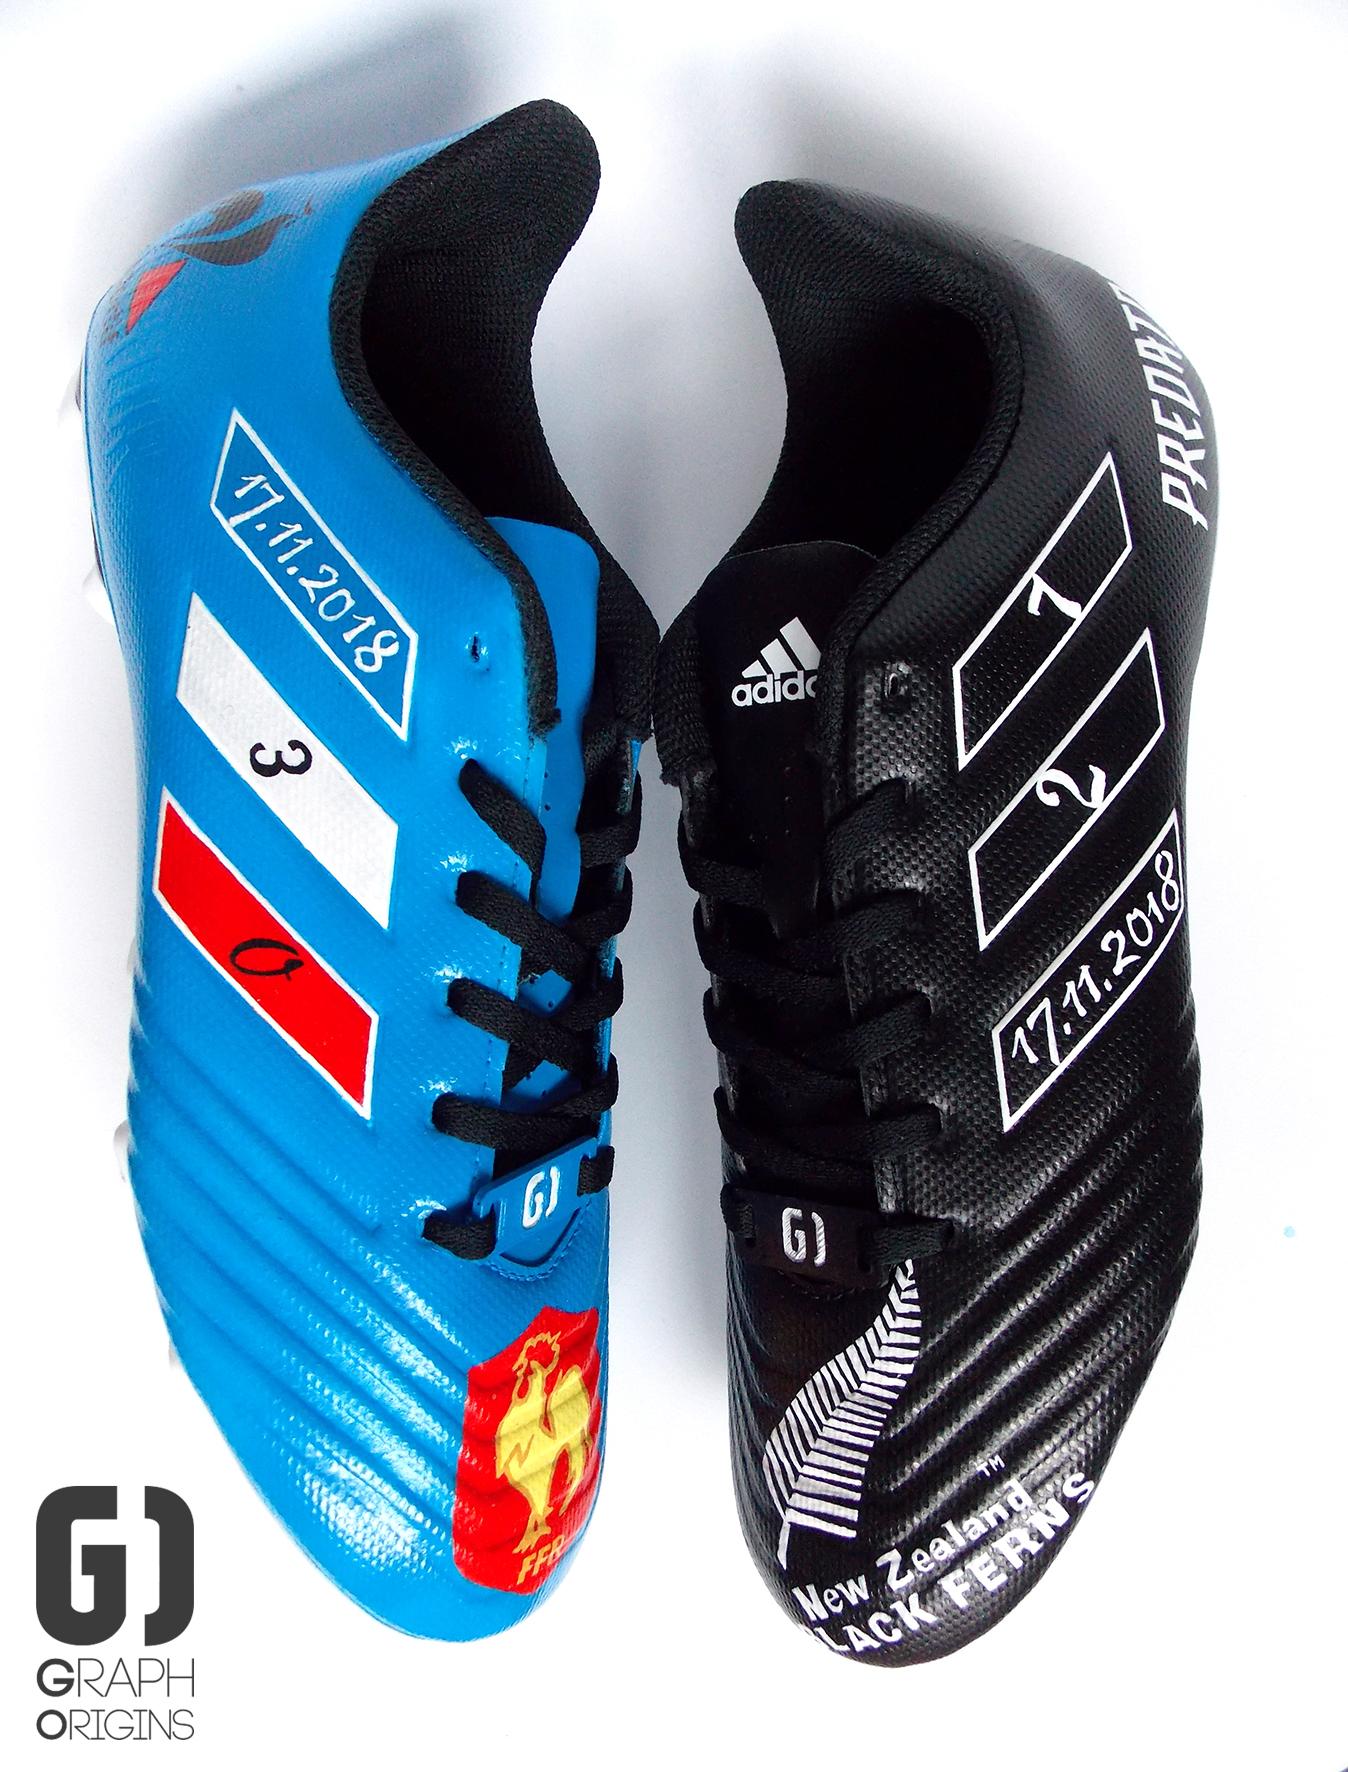 Adidas Predator Caroline Thomas Equipe d